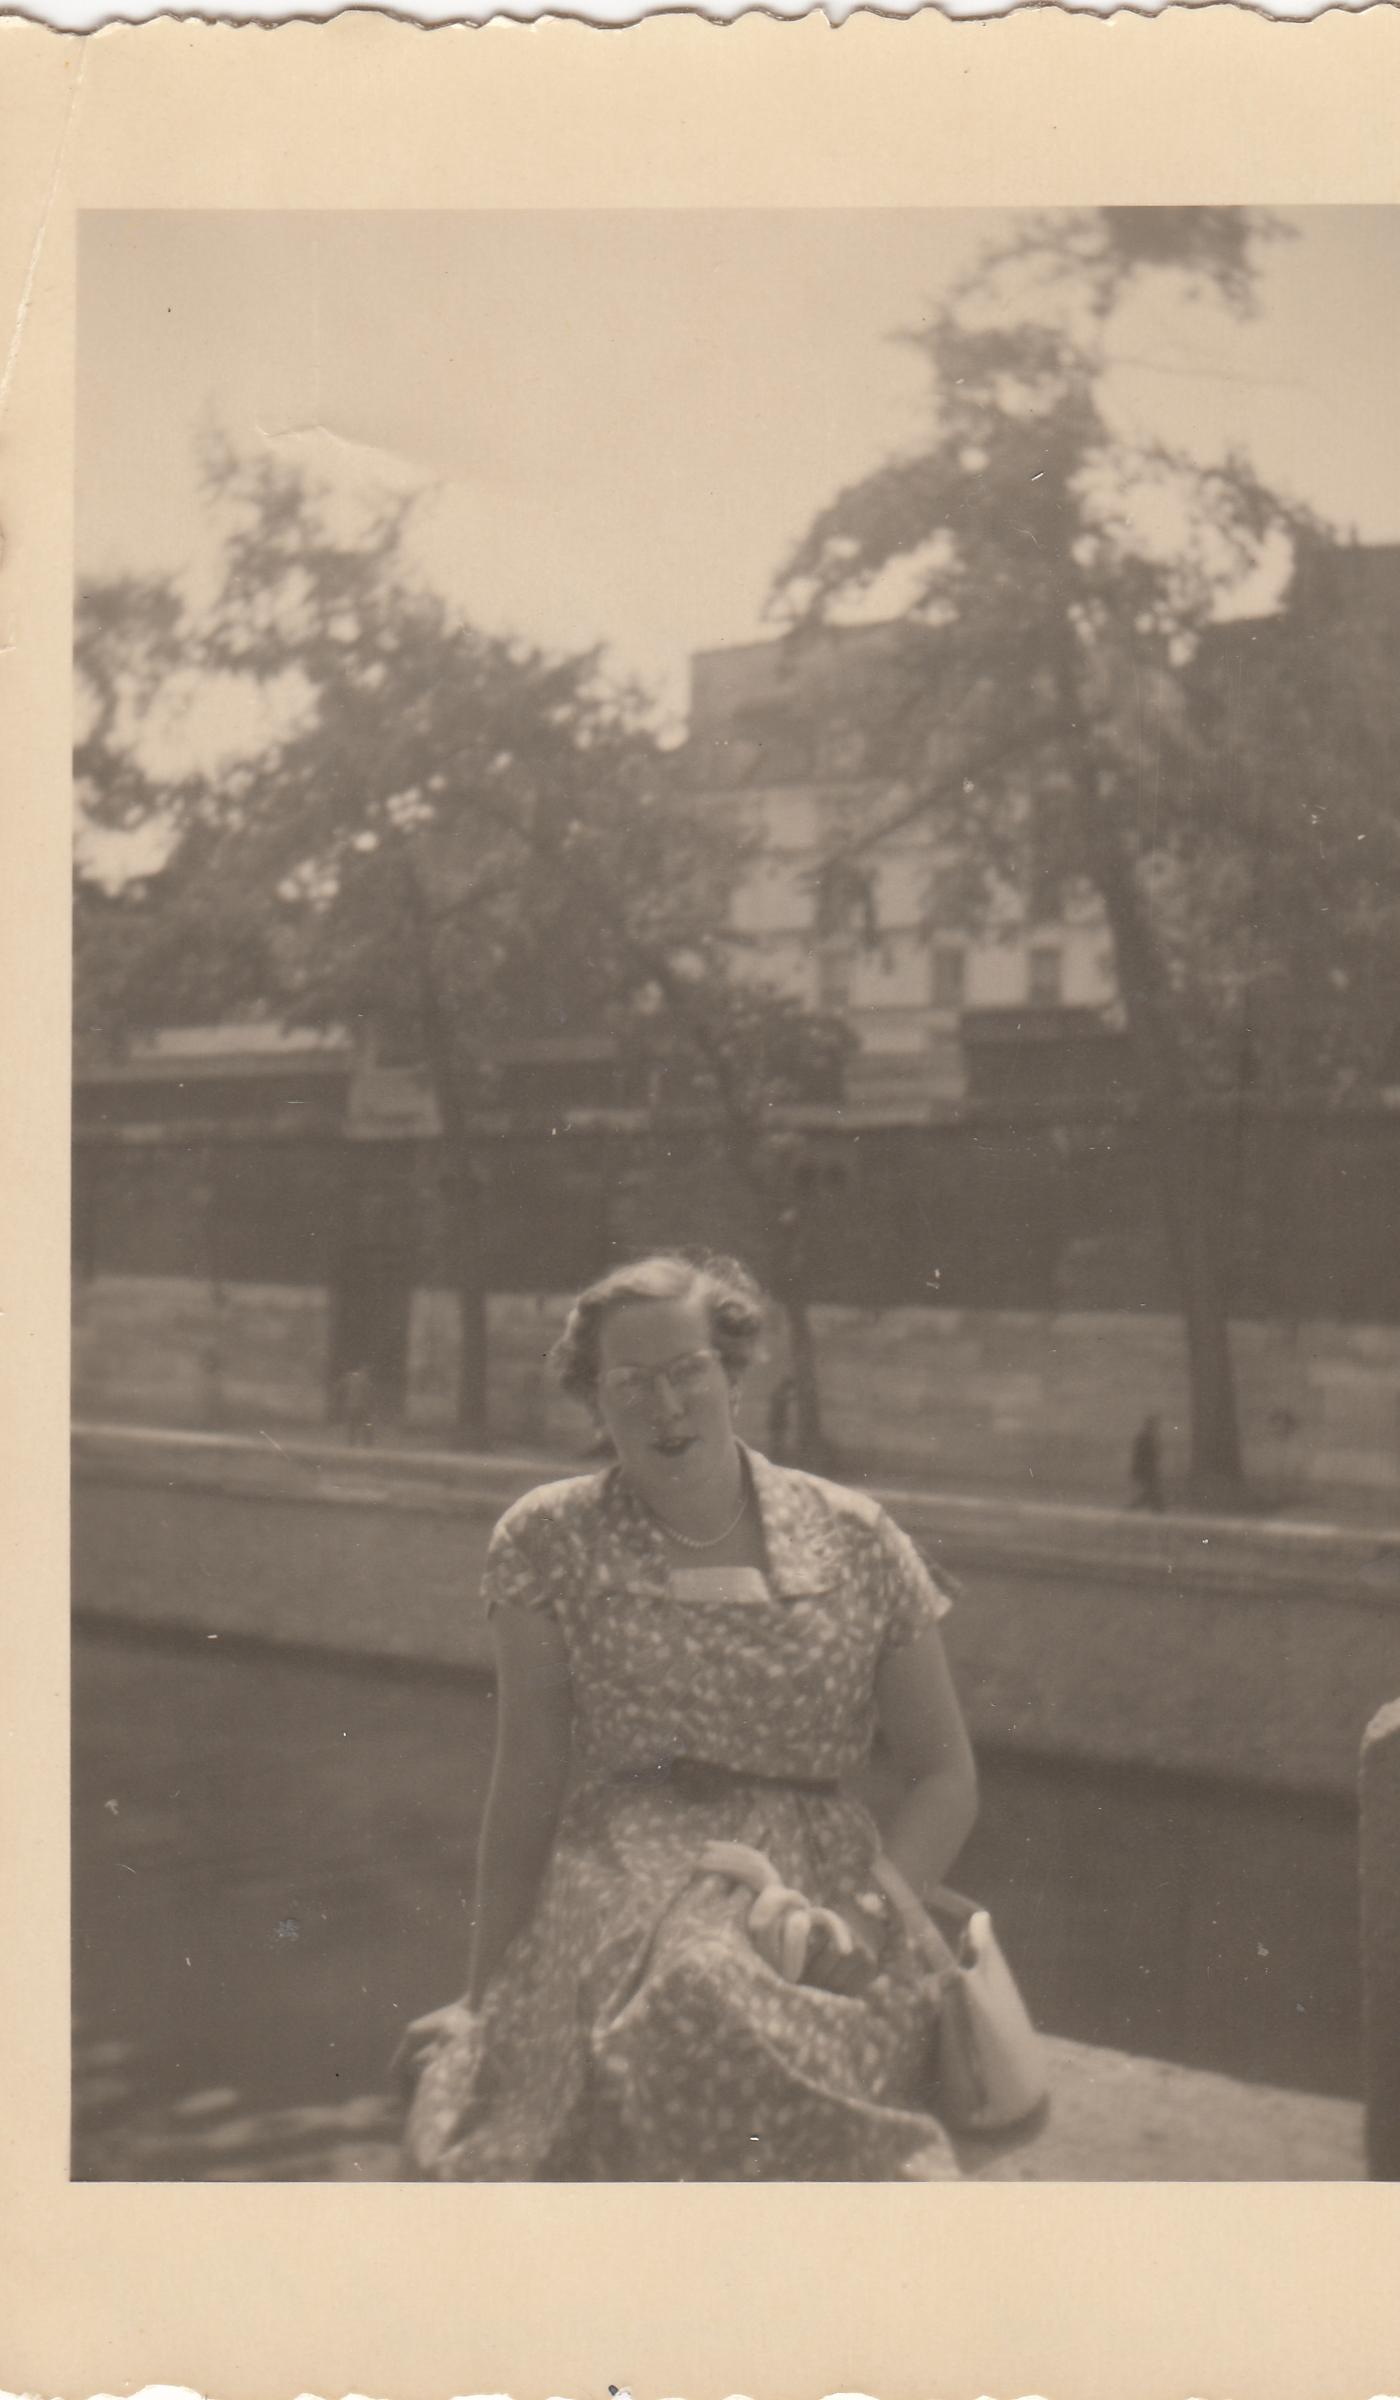 JanetOnTheStepsOfBridgeParisAugust1955.jpg